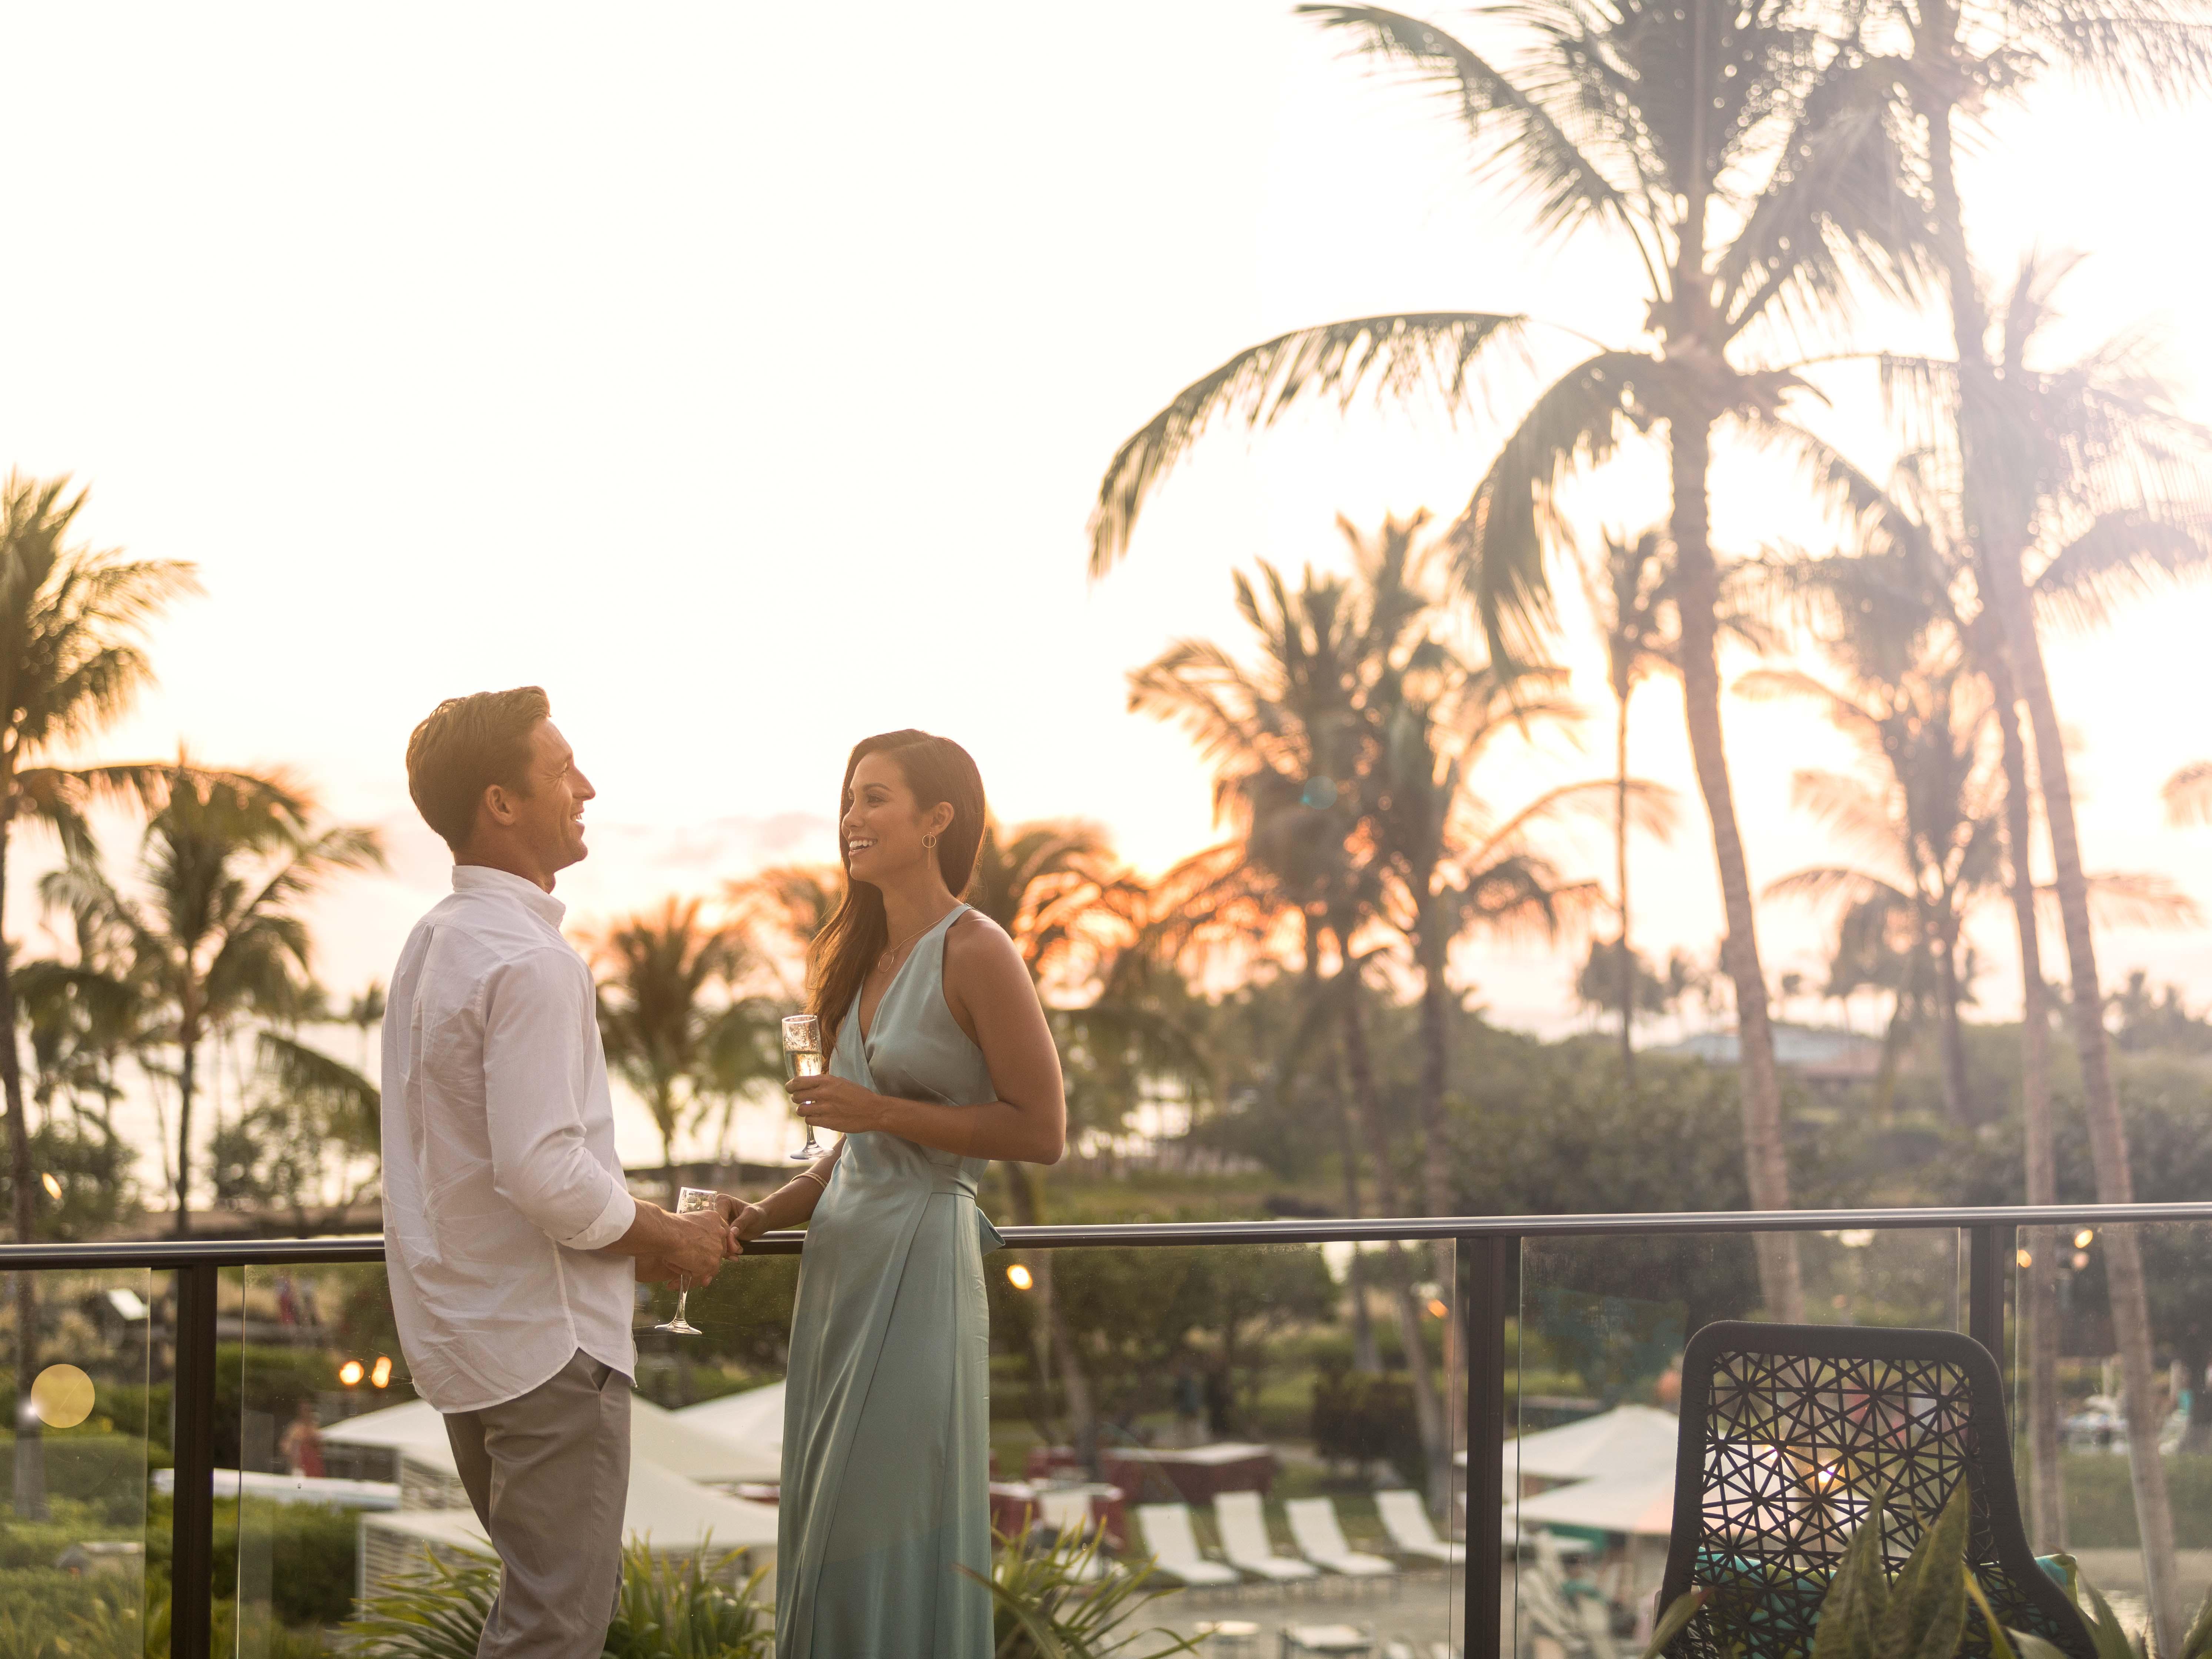 Marriott's Waikoloa Ocean Club Terrace Meeting. Marriott's Waikoloa Ocean Club is located in Waikoloa Beach, Big Island, Hawai'i United States.